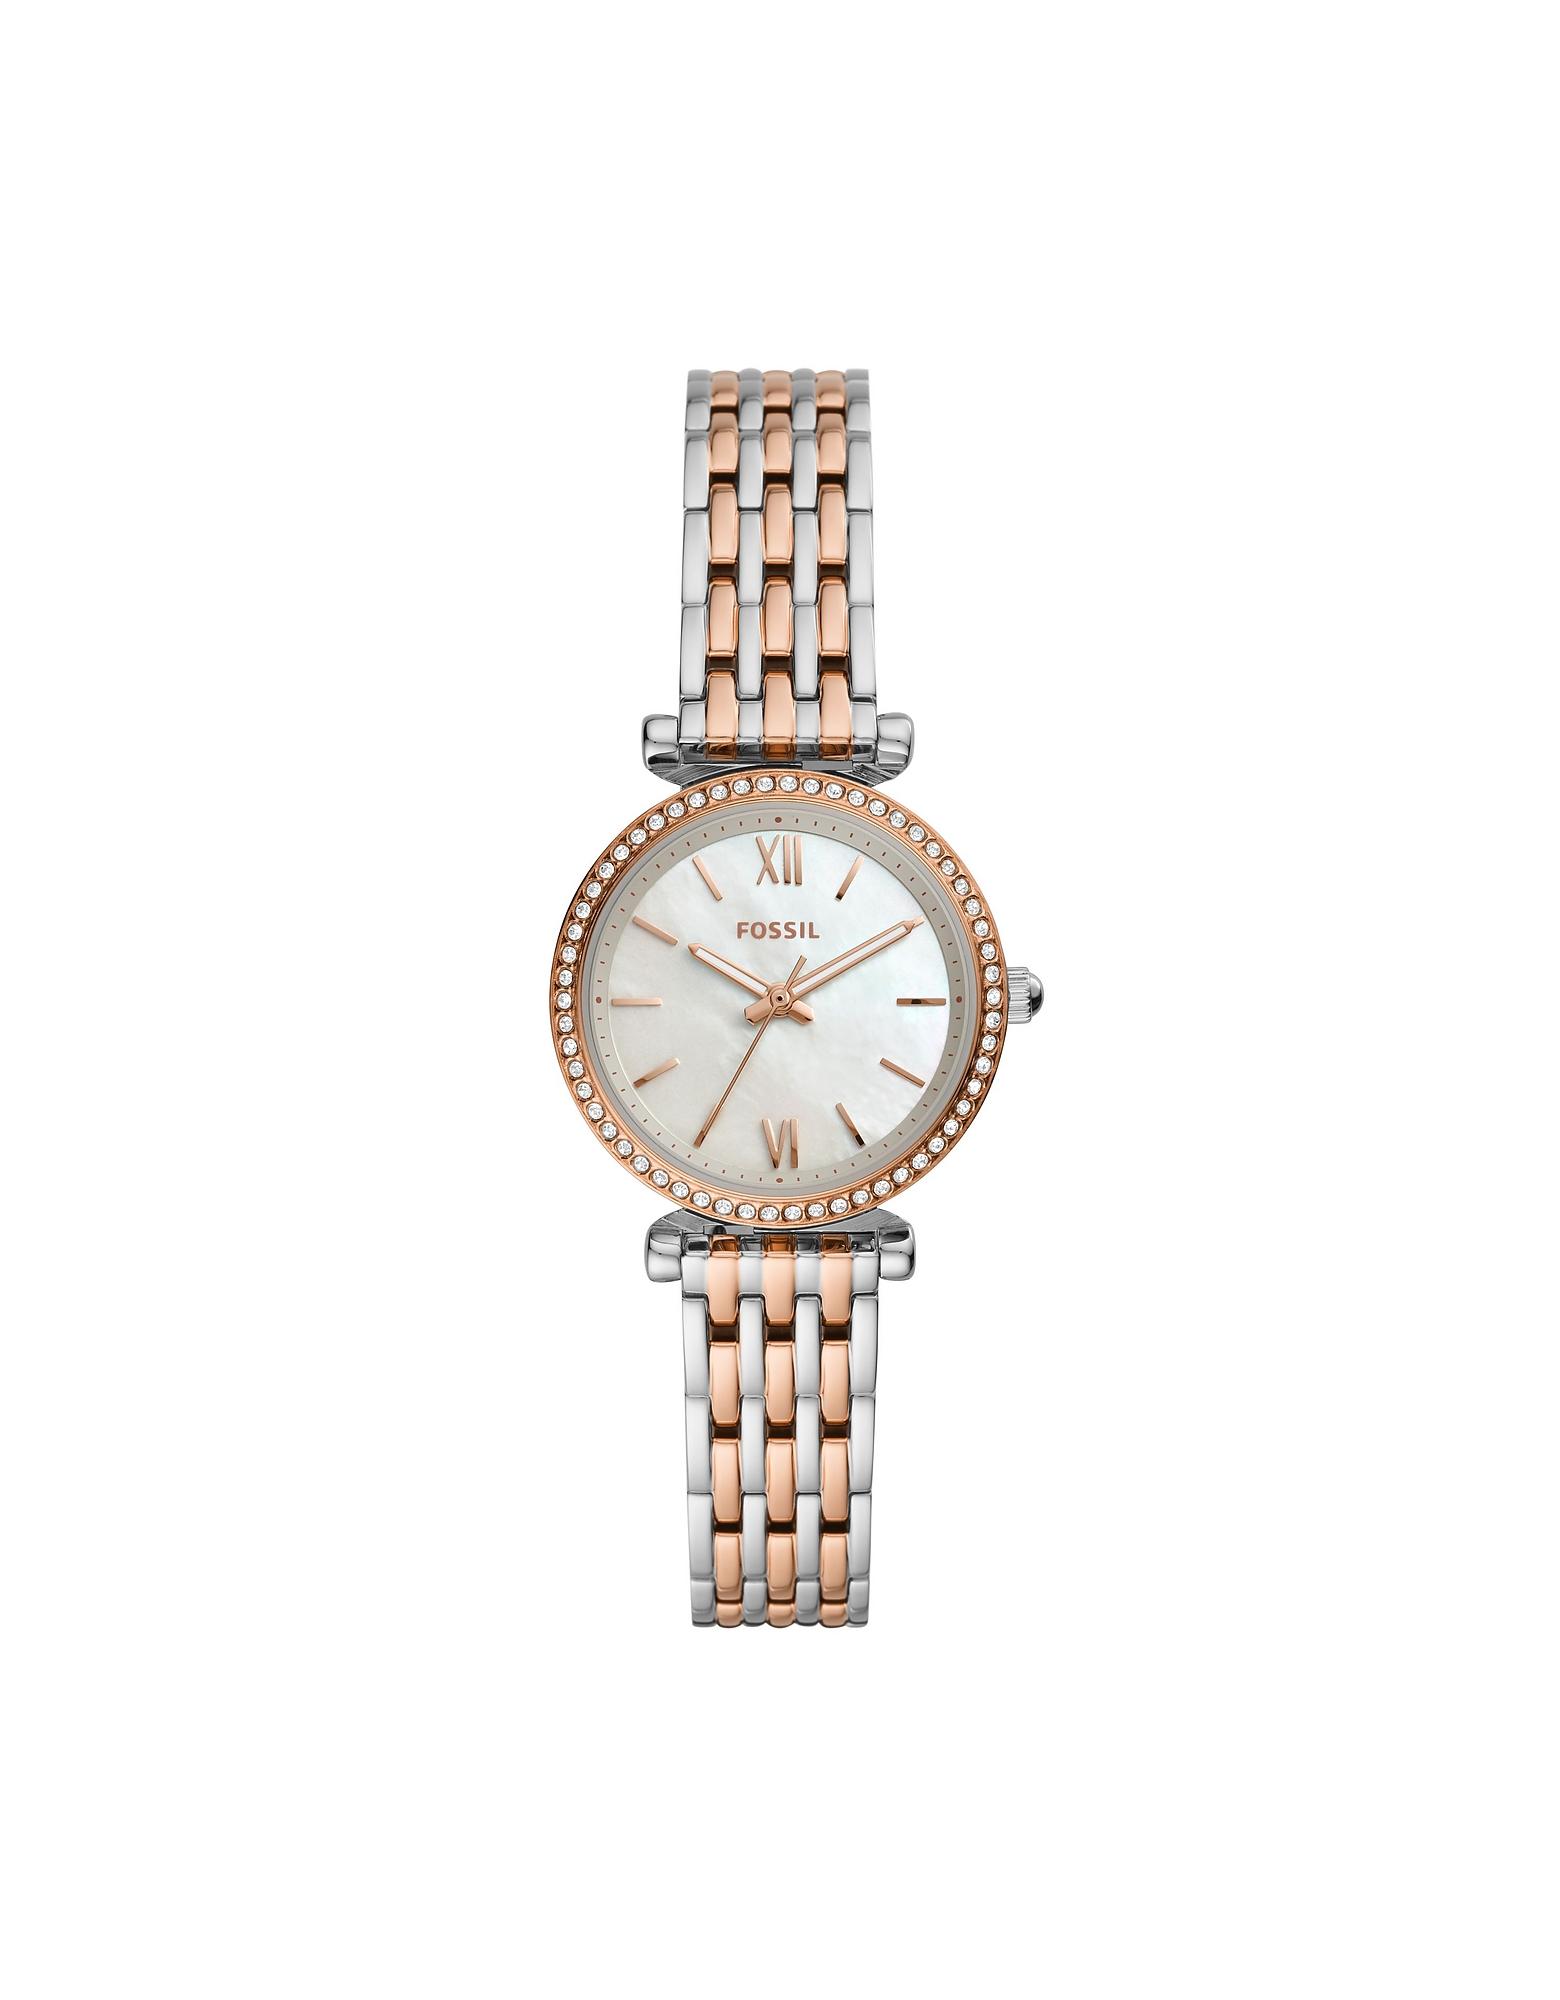 Fossil Carlie Mini Stainless Steel Women's Watch In Silver